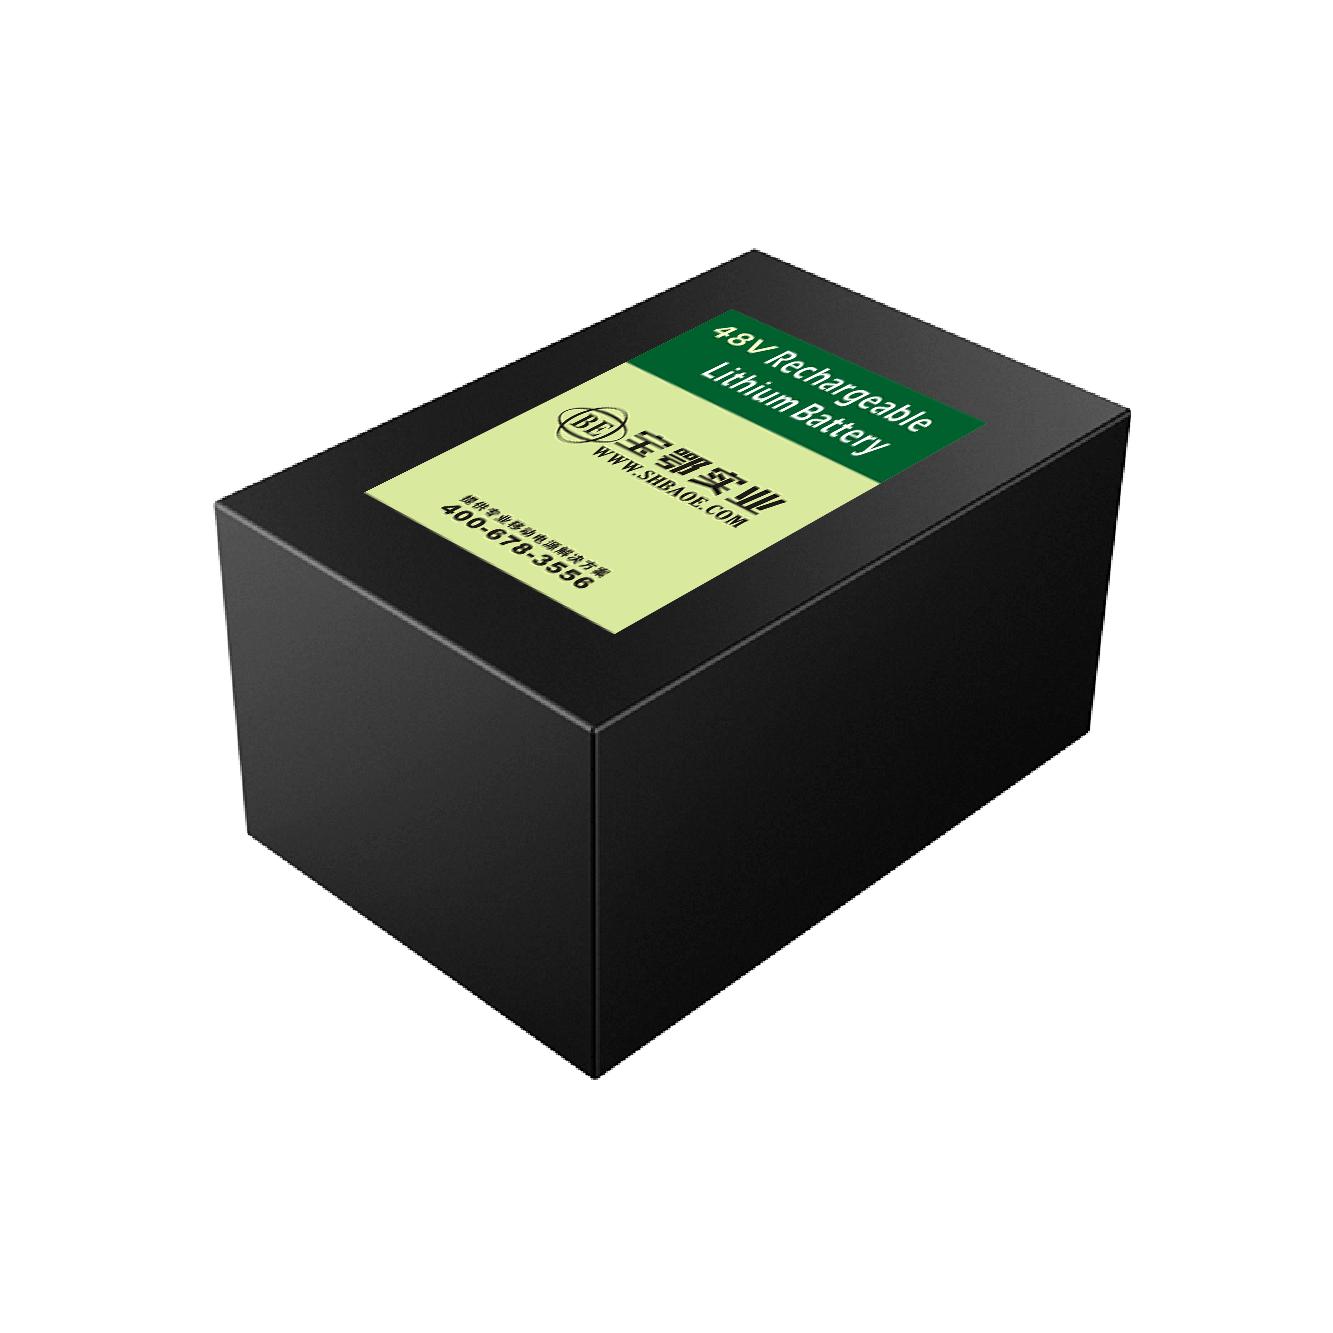 48V-34.8AH仓储智能物流车锂电池